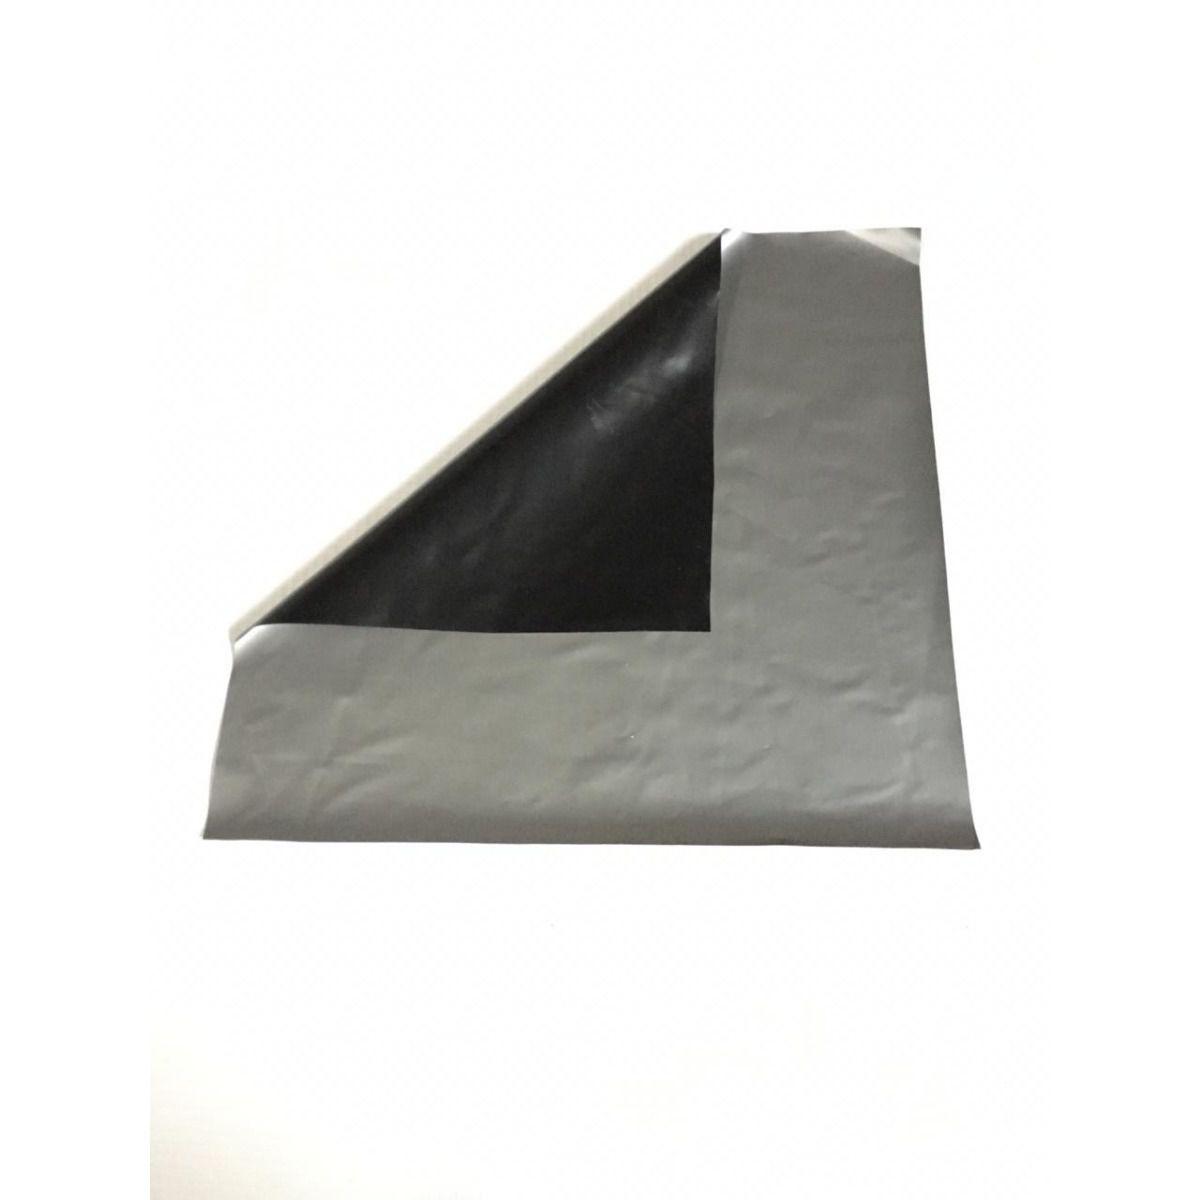 Lona Para Silagem Dupla Face Prata/Preta 40x12 Aprox 150 Mic